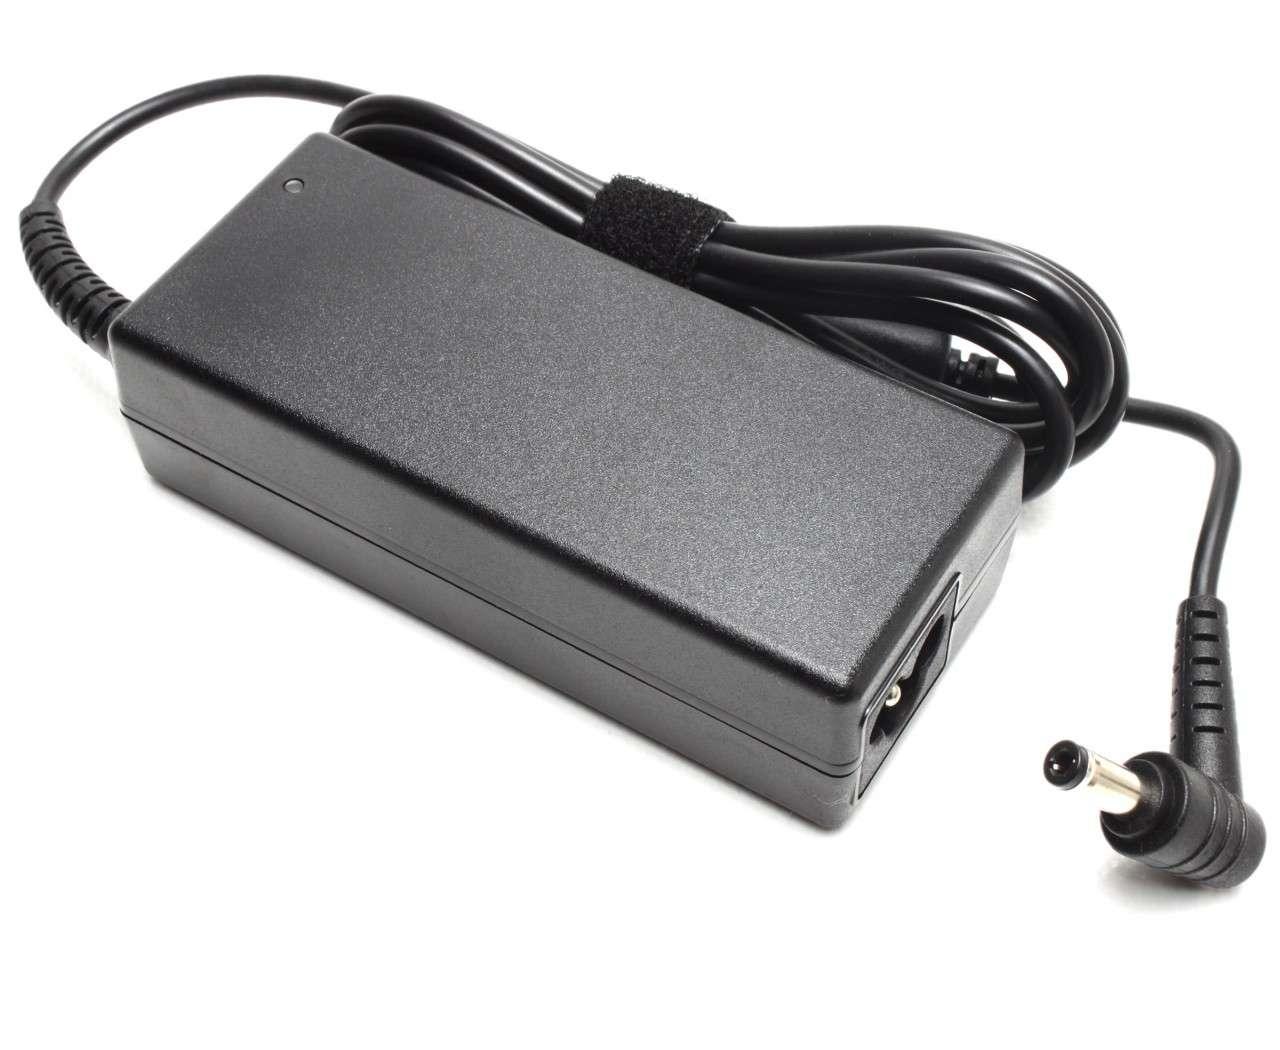 Incarcator Philips Freevents 12NB5800 imagine powerlaptop.ro 2021